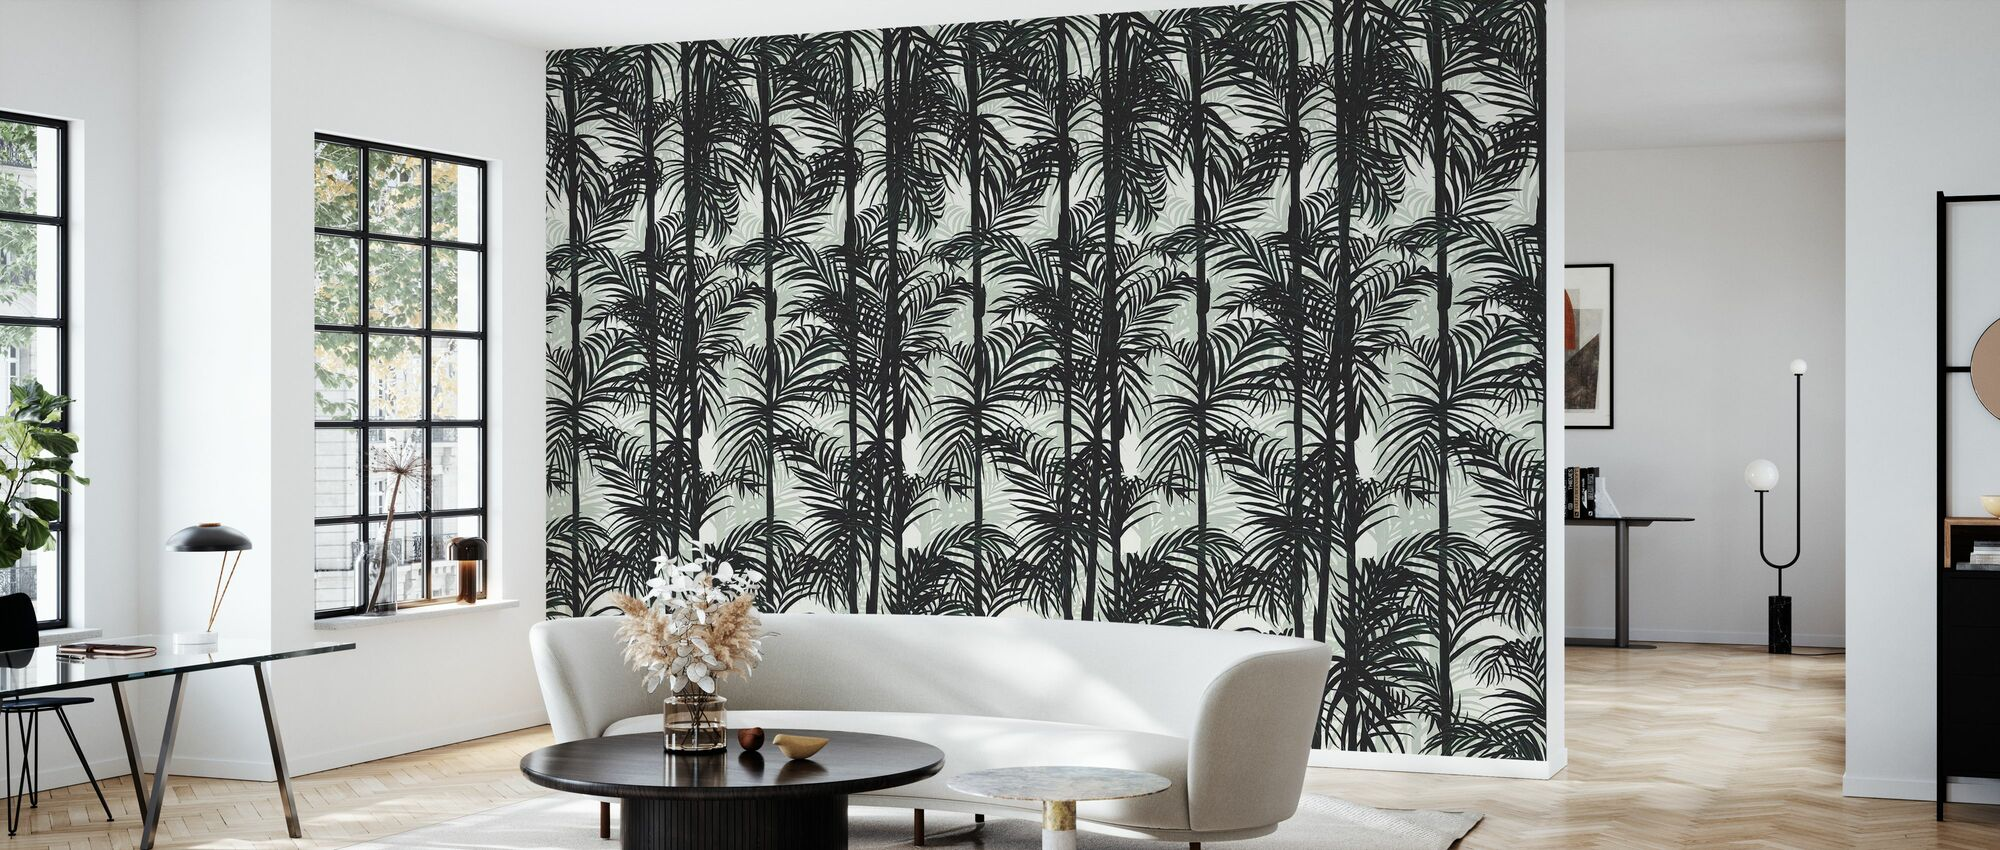 Botany Bamboo - Deep Green - Wallpaper - Living Room